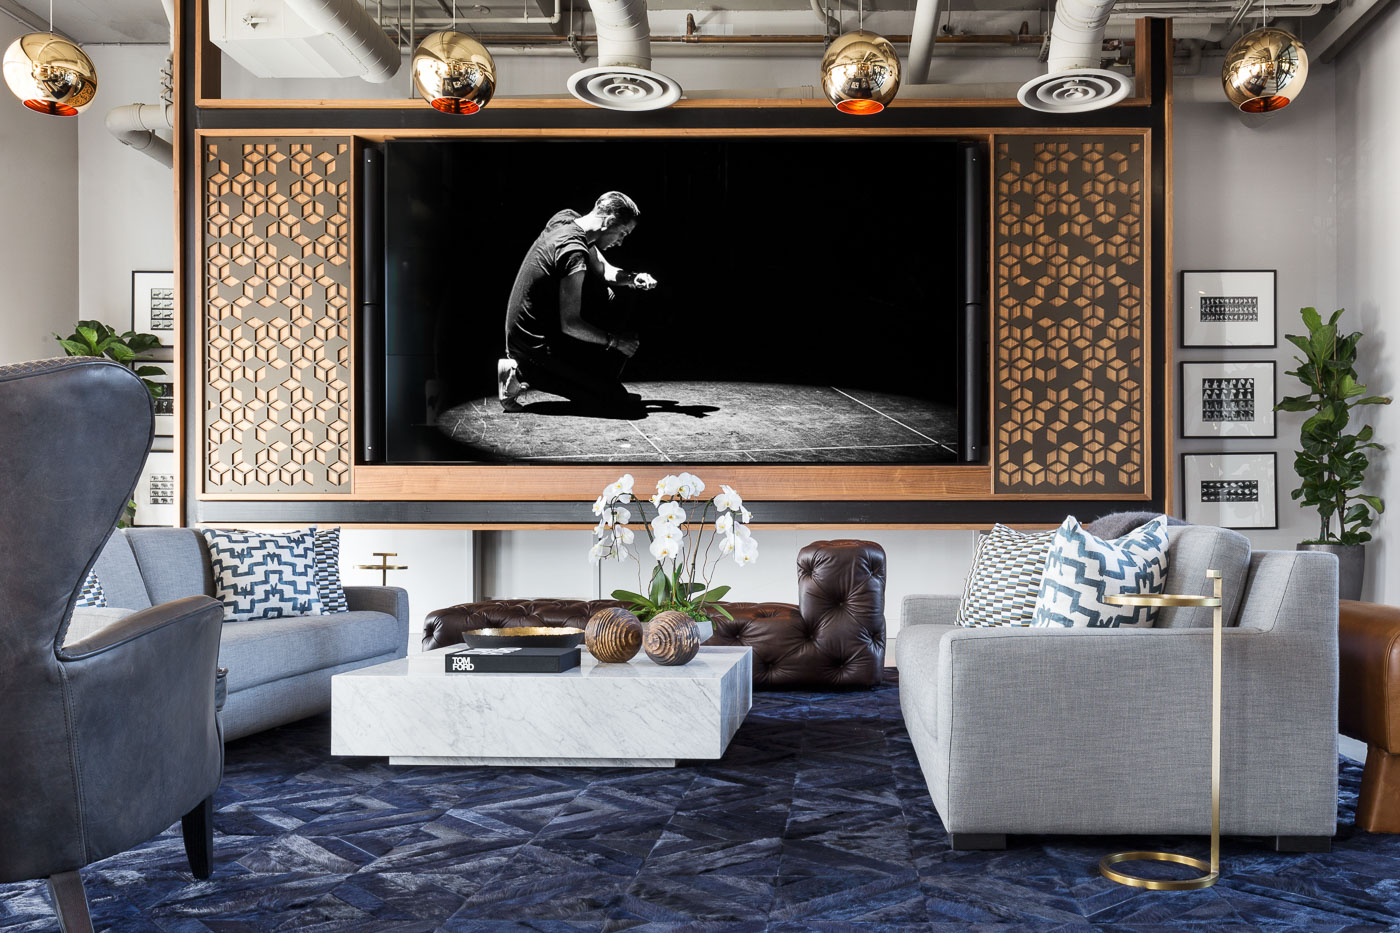 parisa oconnell ALX Lounge 2.jpg